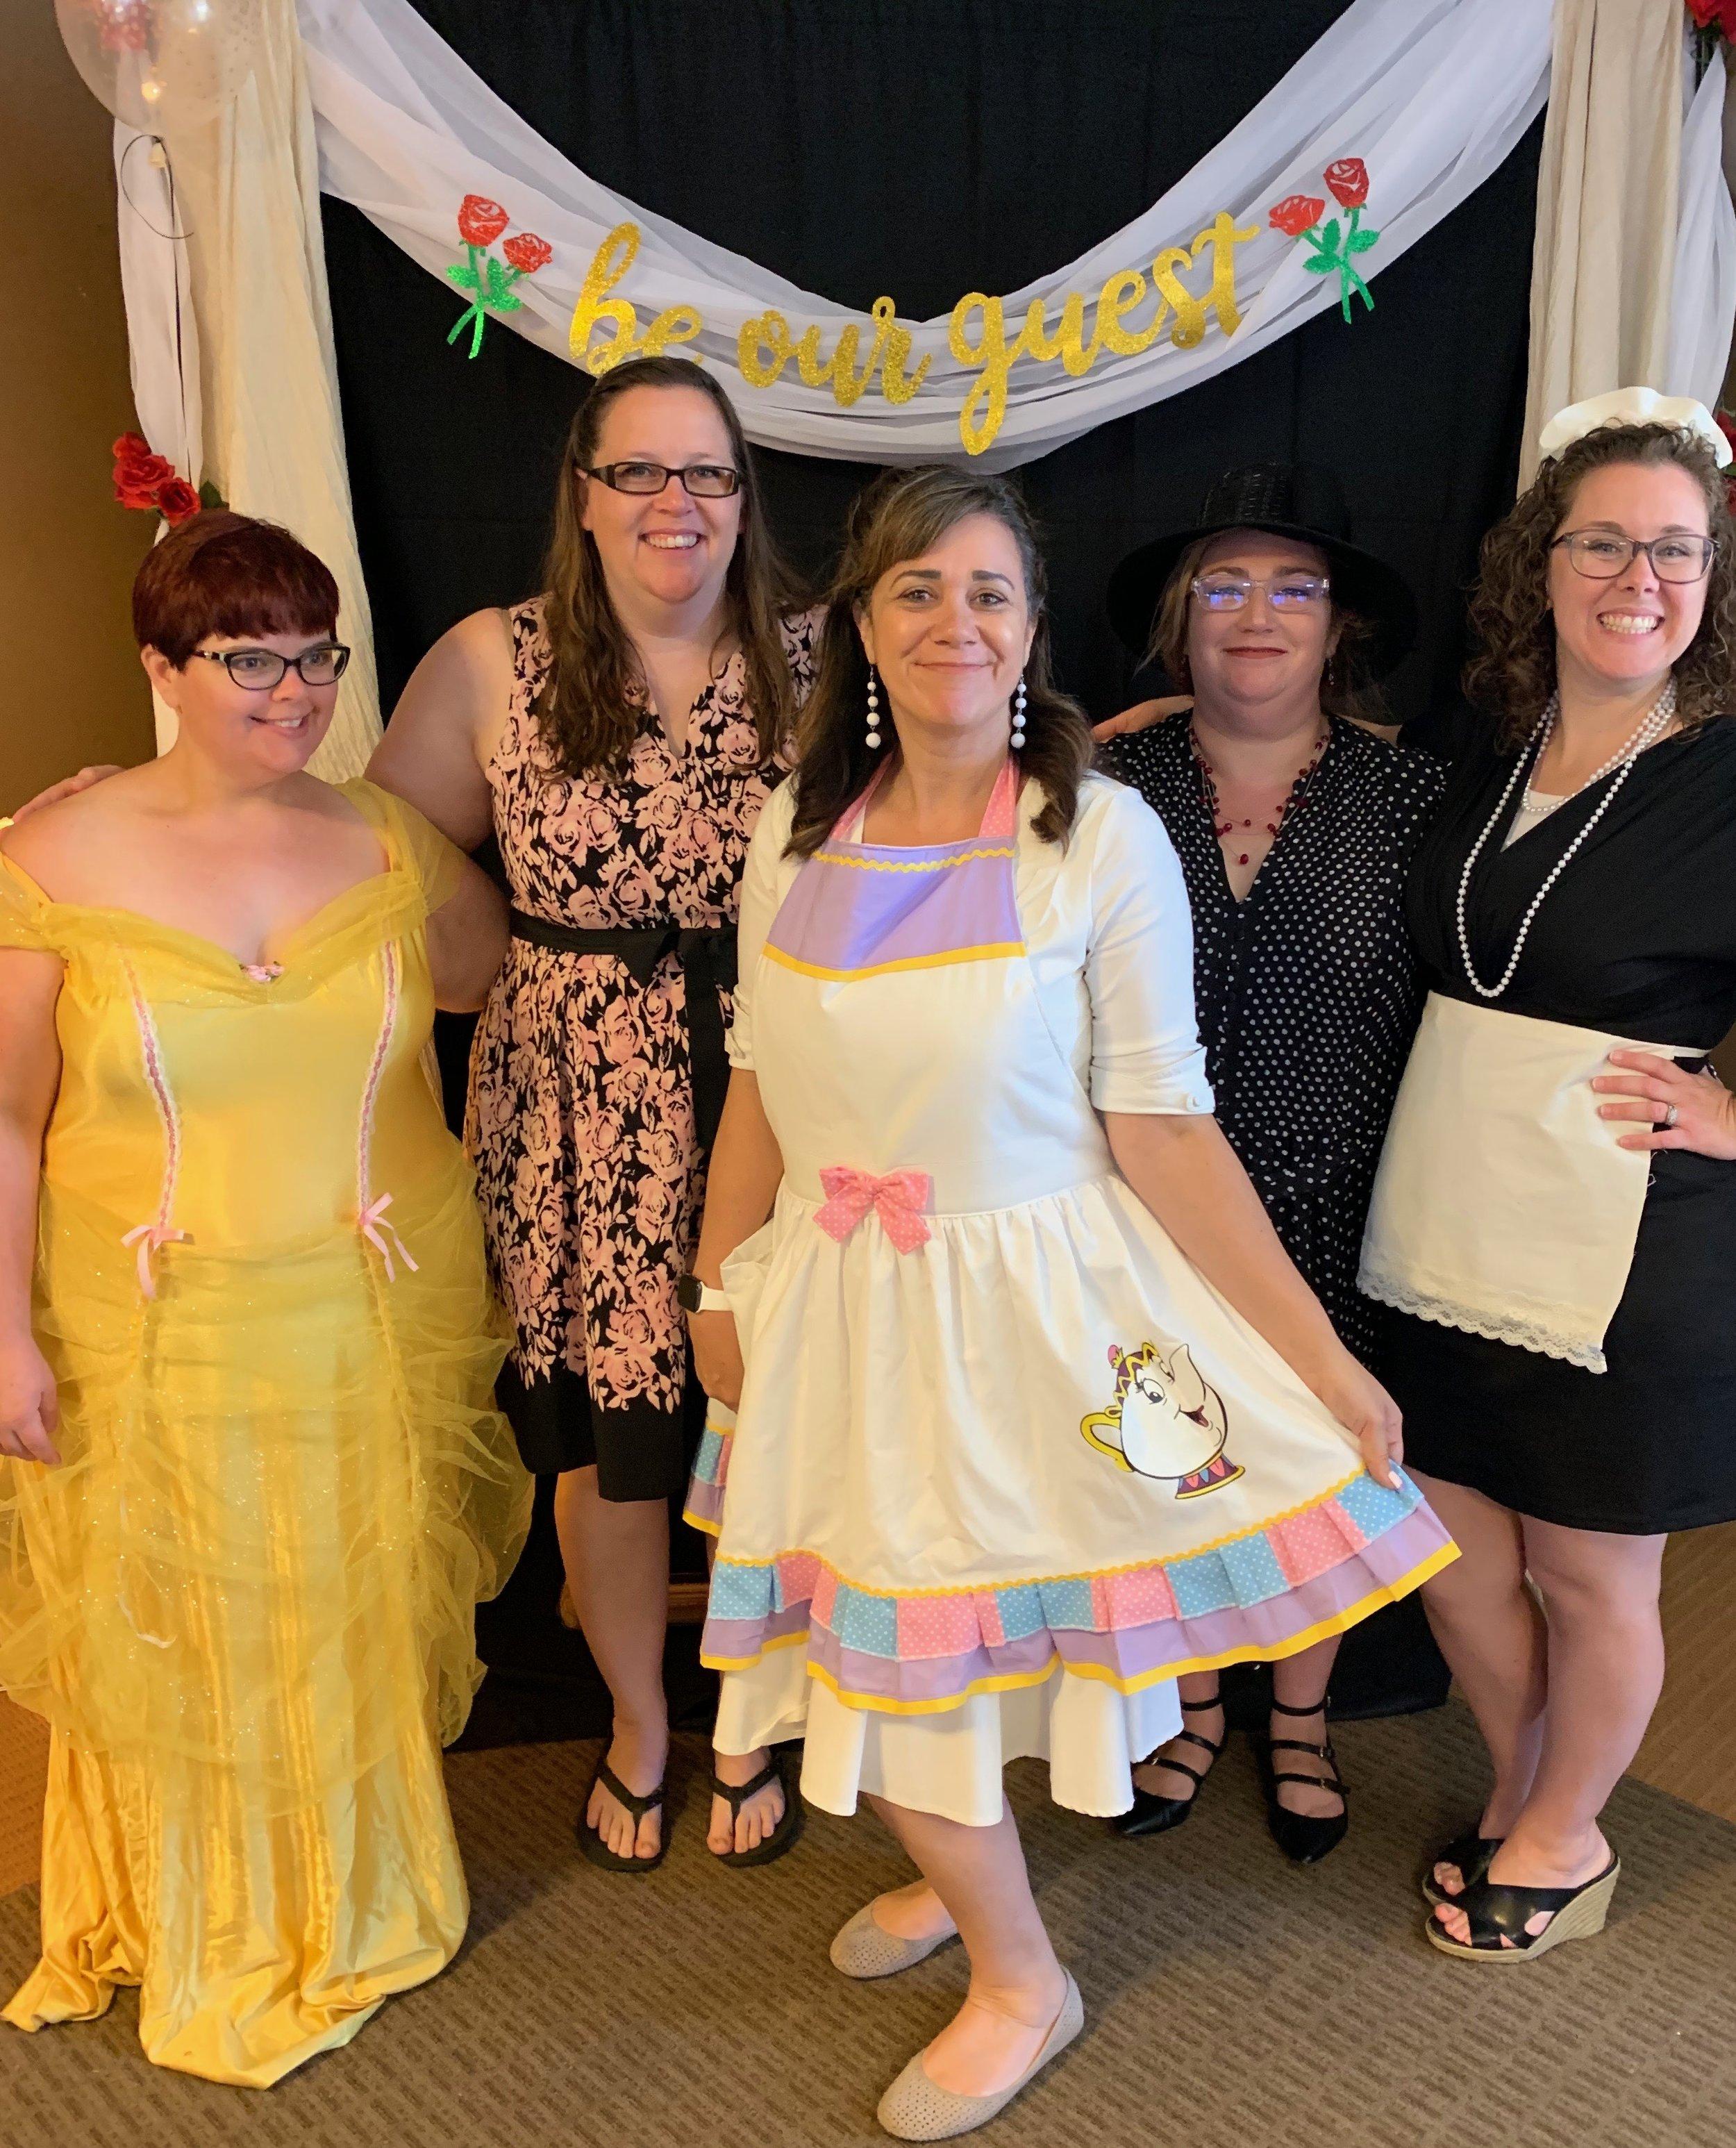 The Beauties - Tea Team (left to right) Jennifer King, Kim Merriam,Lea Aragon, Stephanie Mendoza, Shannon Lipscomb